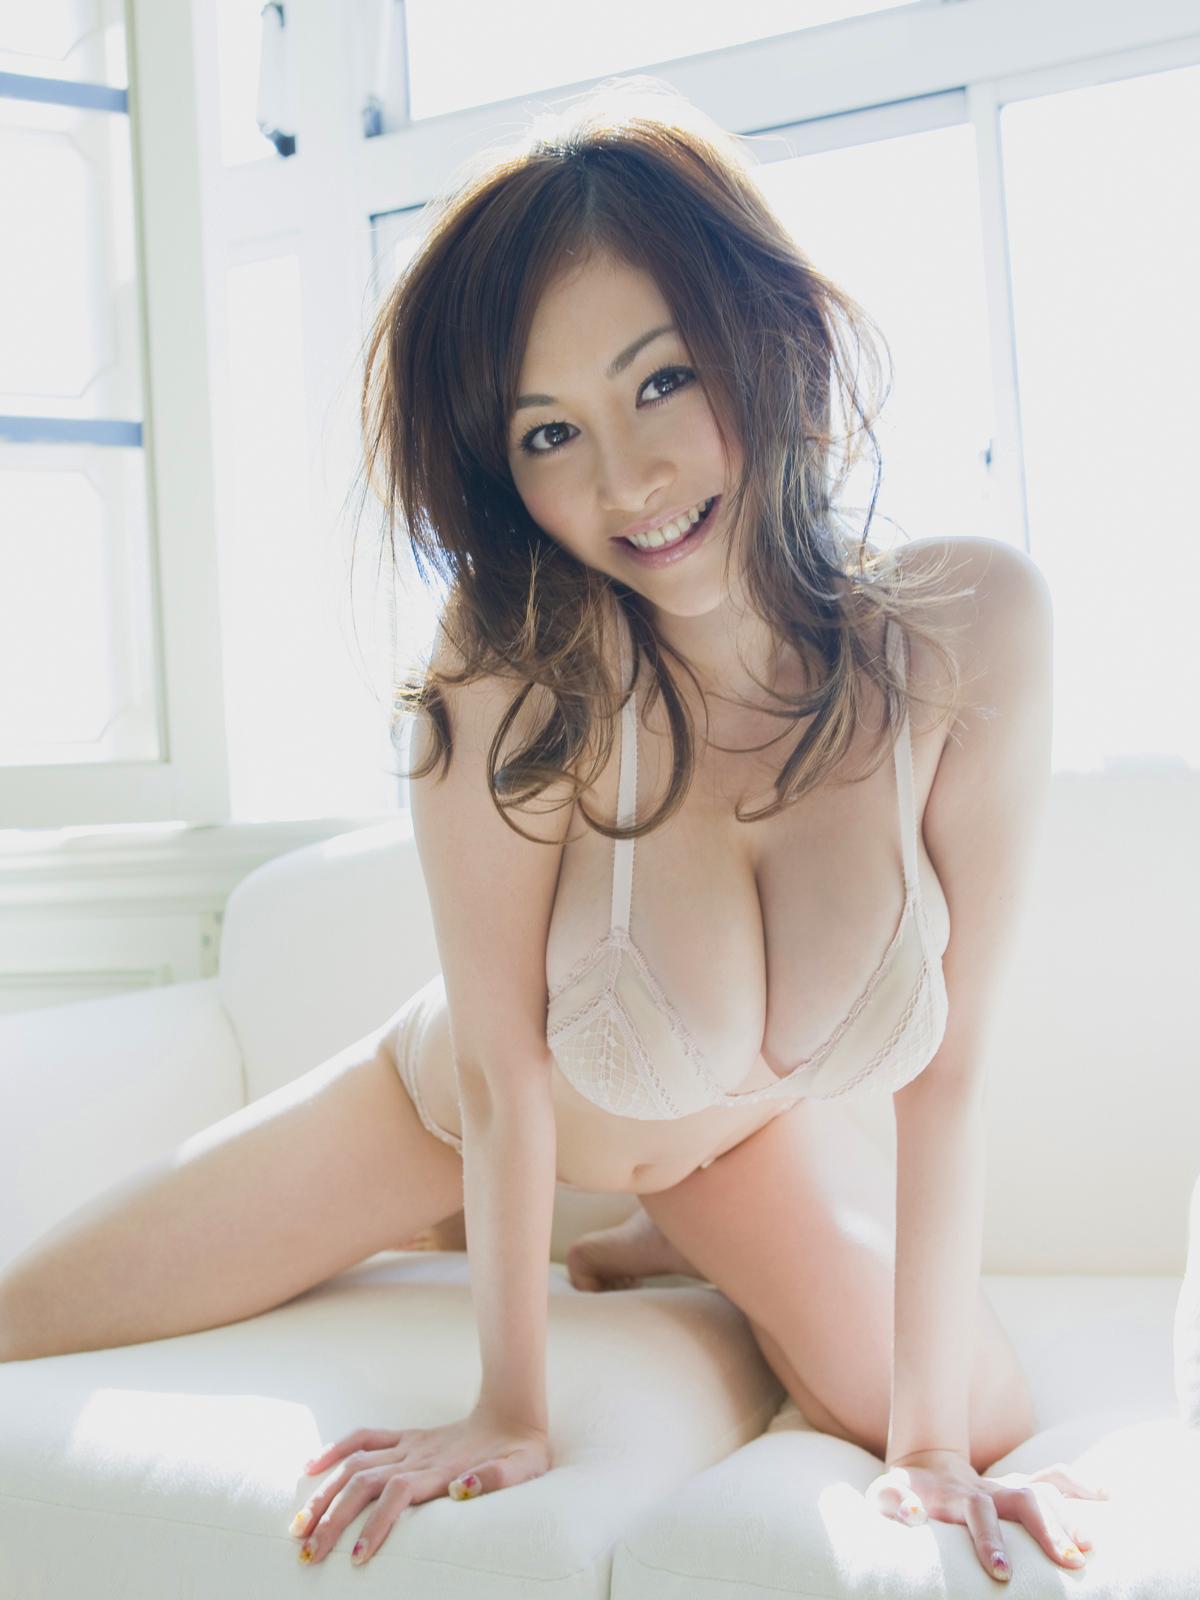 Japonesas hot